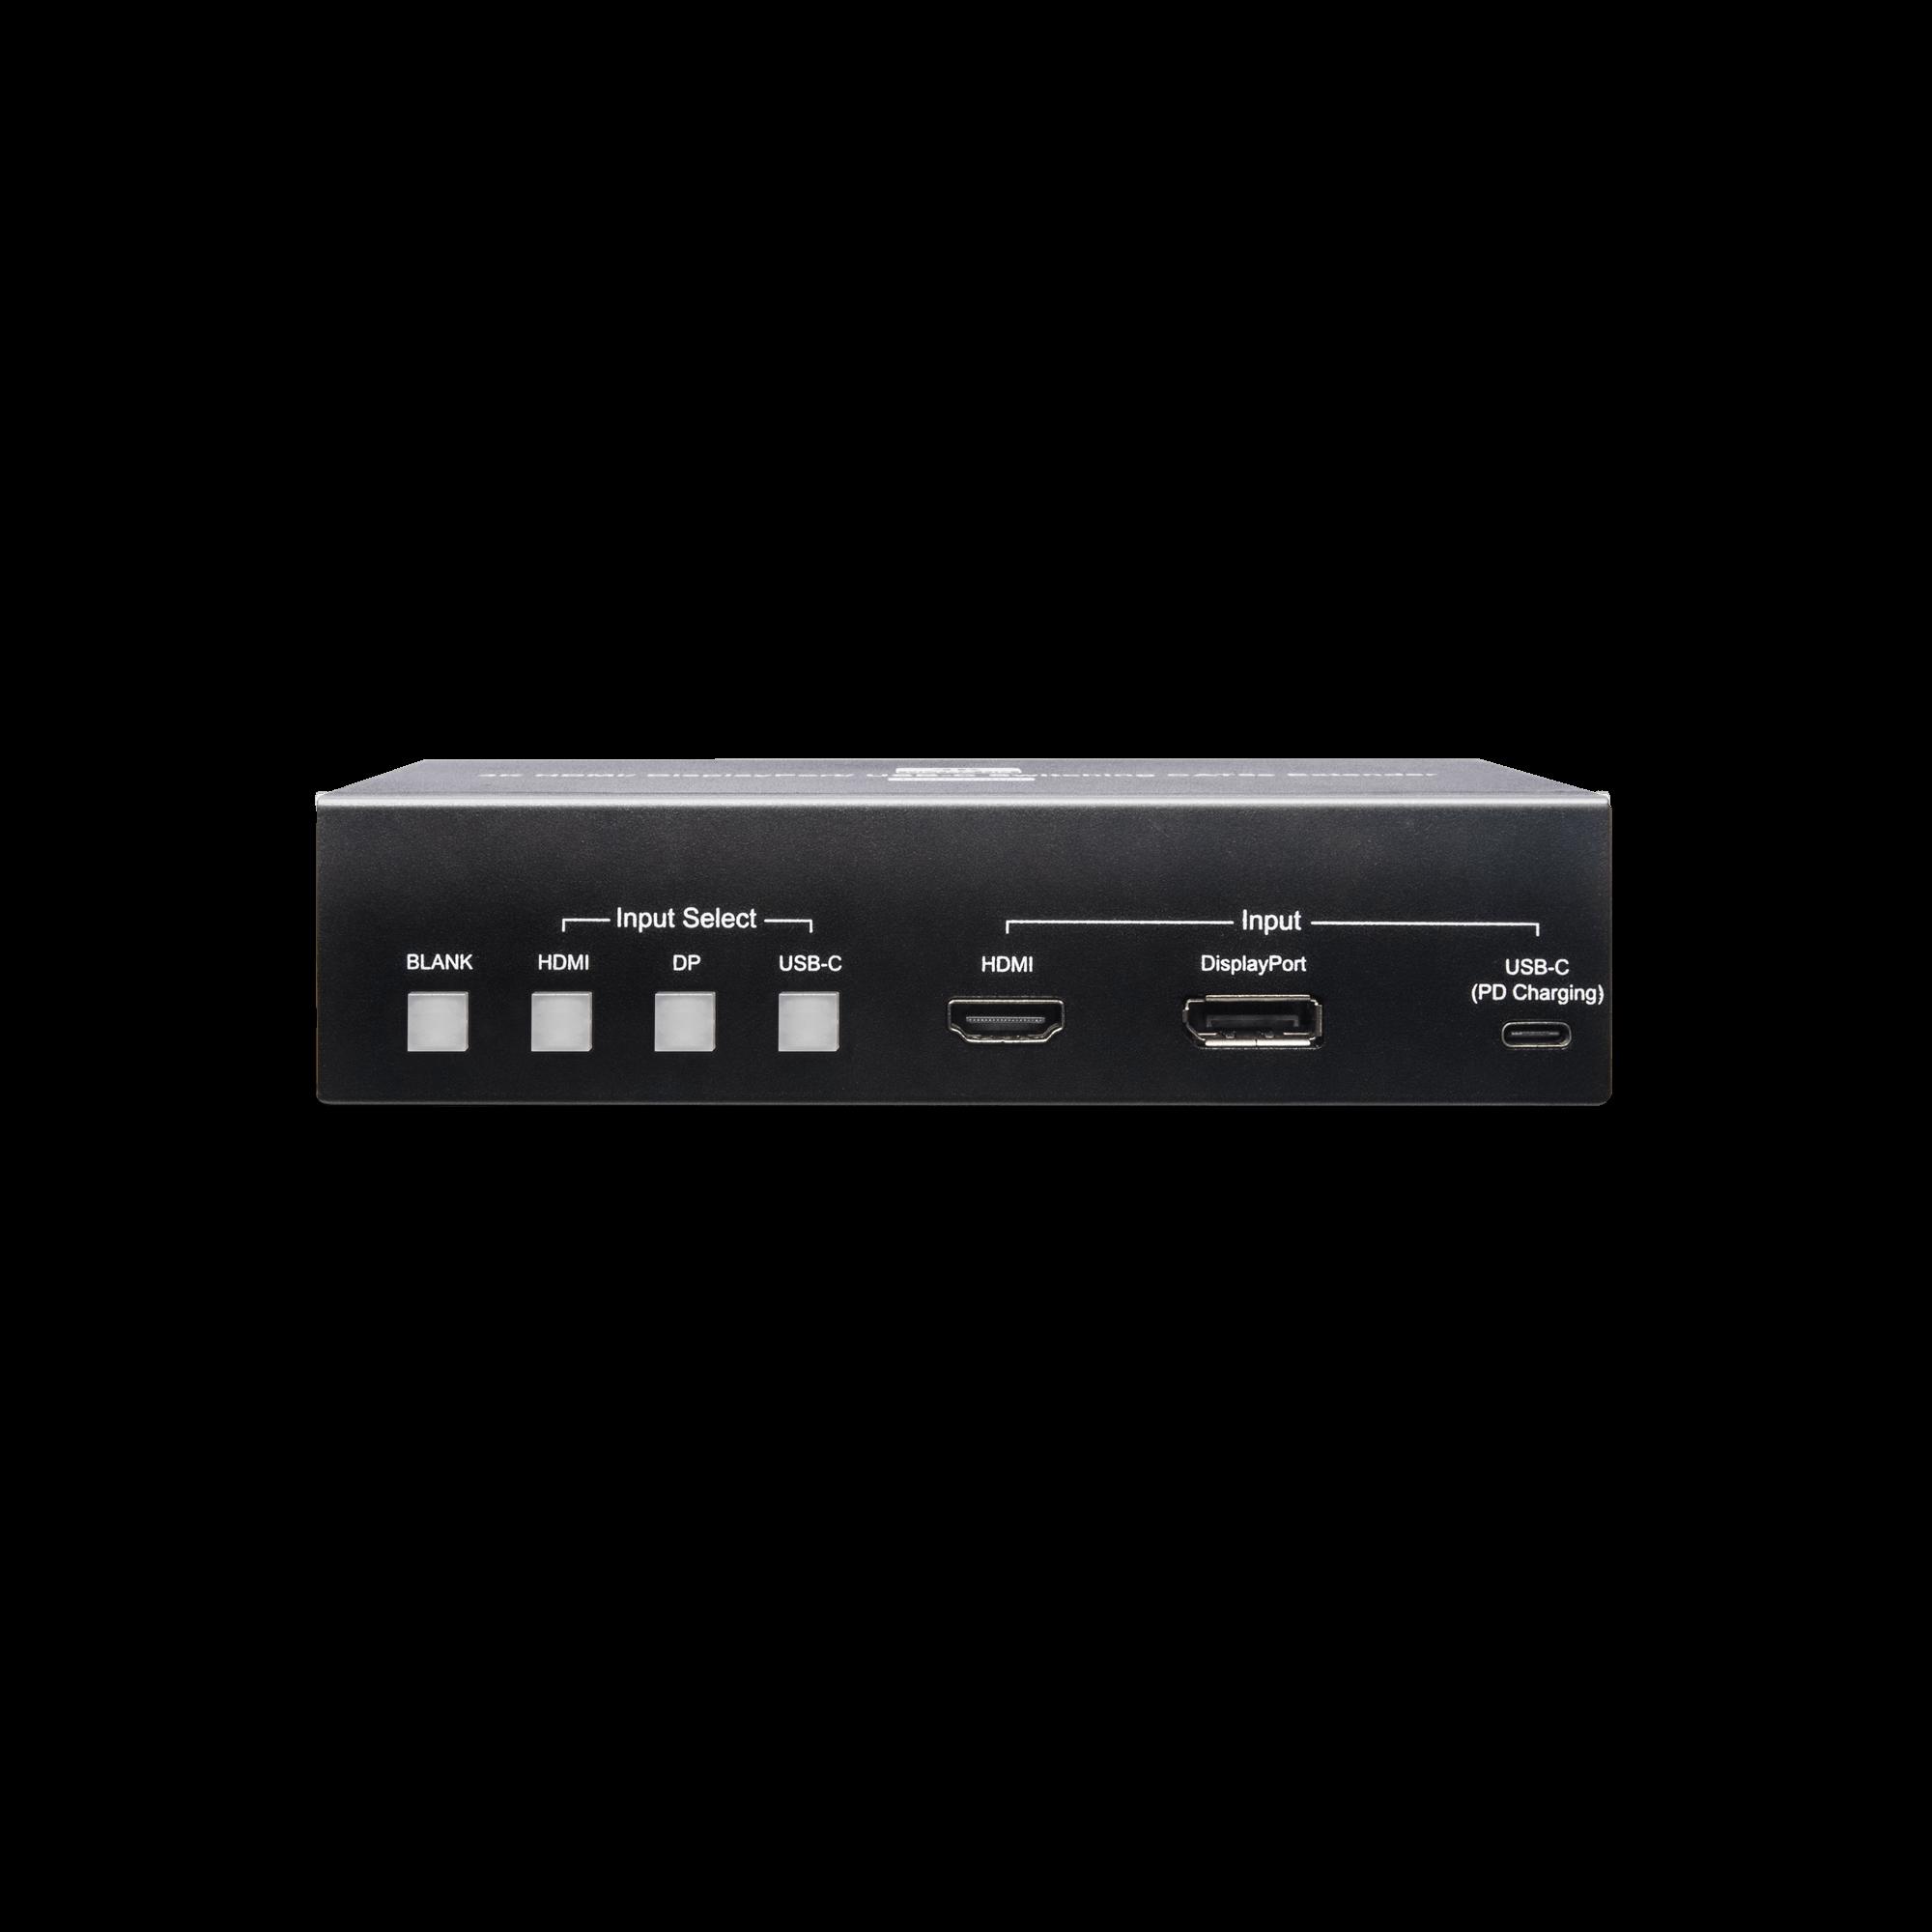 4K 60Hz HDMI/ Display Port/ USB-C Switching Extender